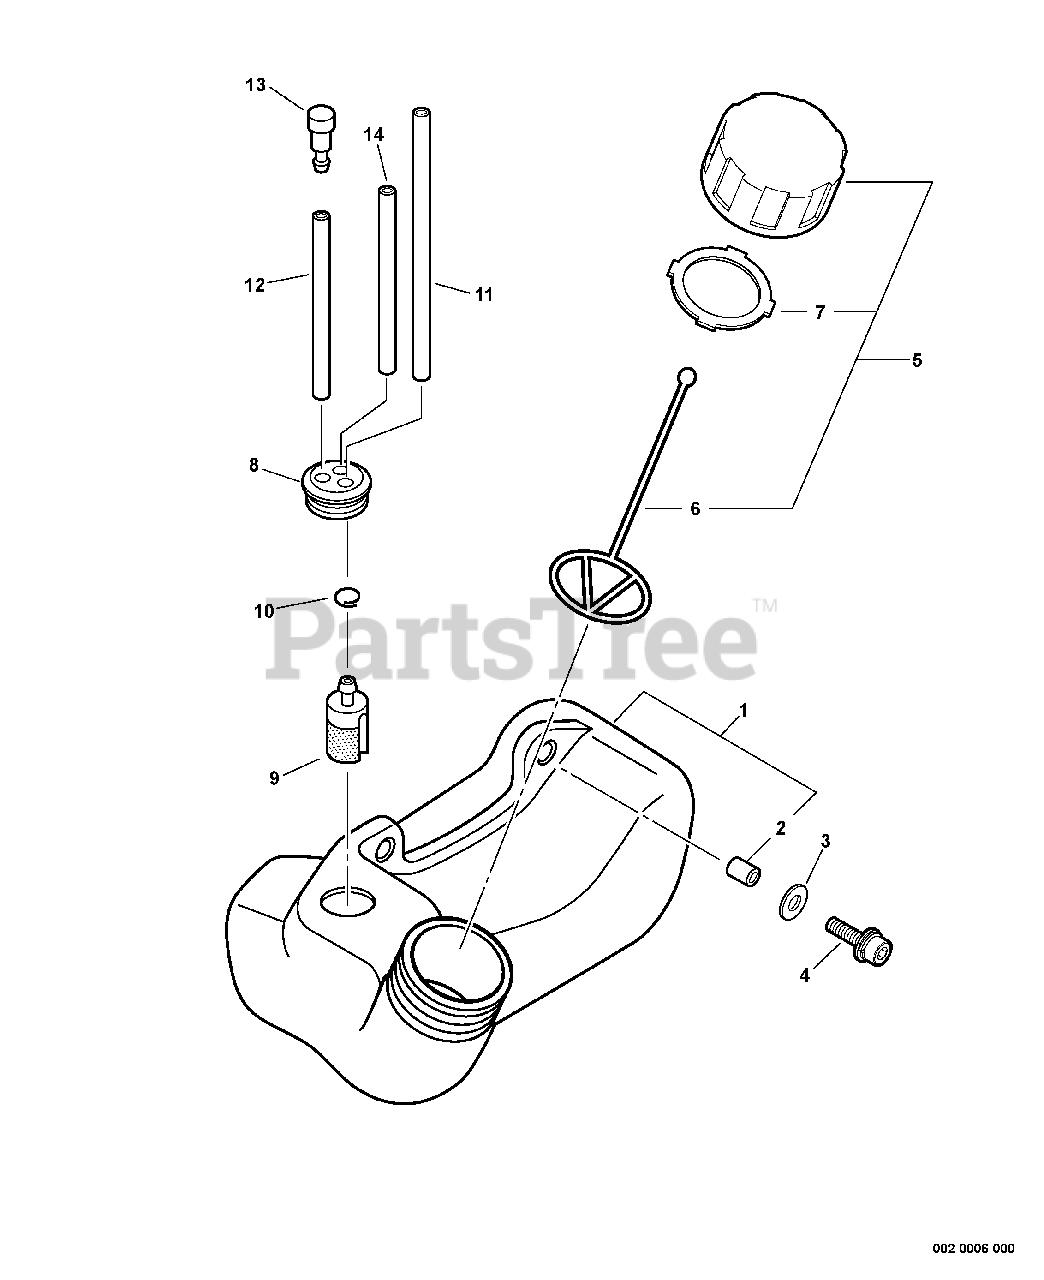 Echo GT-200R - Echo String Trimmer (SN: 05001001 - 05999999) Fuel System  Parts Lookup with Diagrams   PartsTreePartsTree